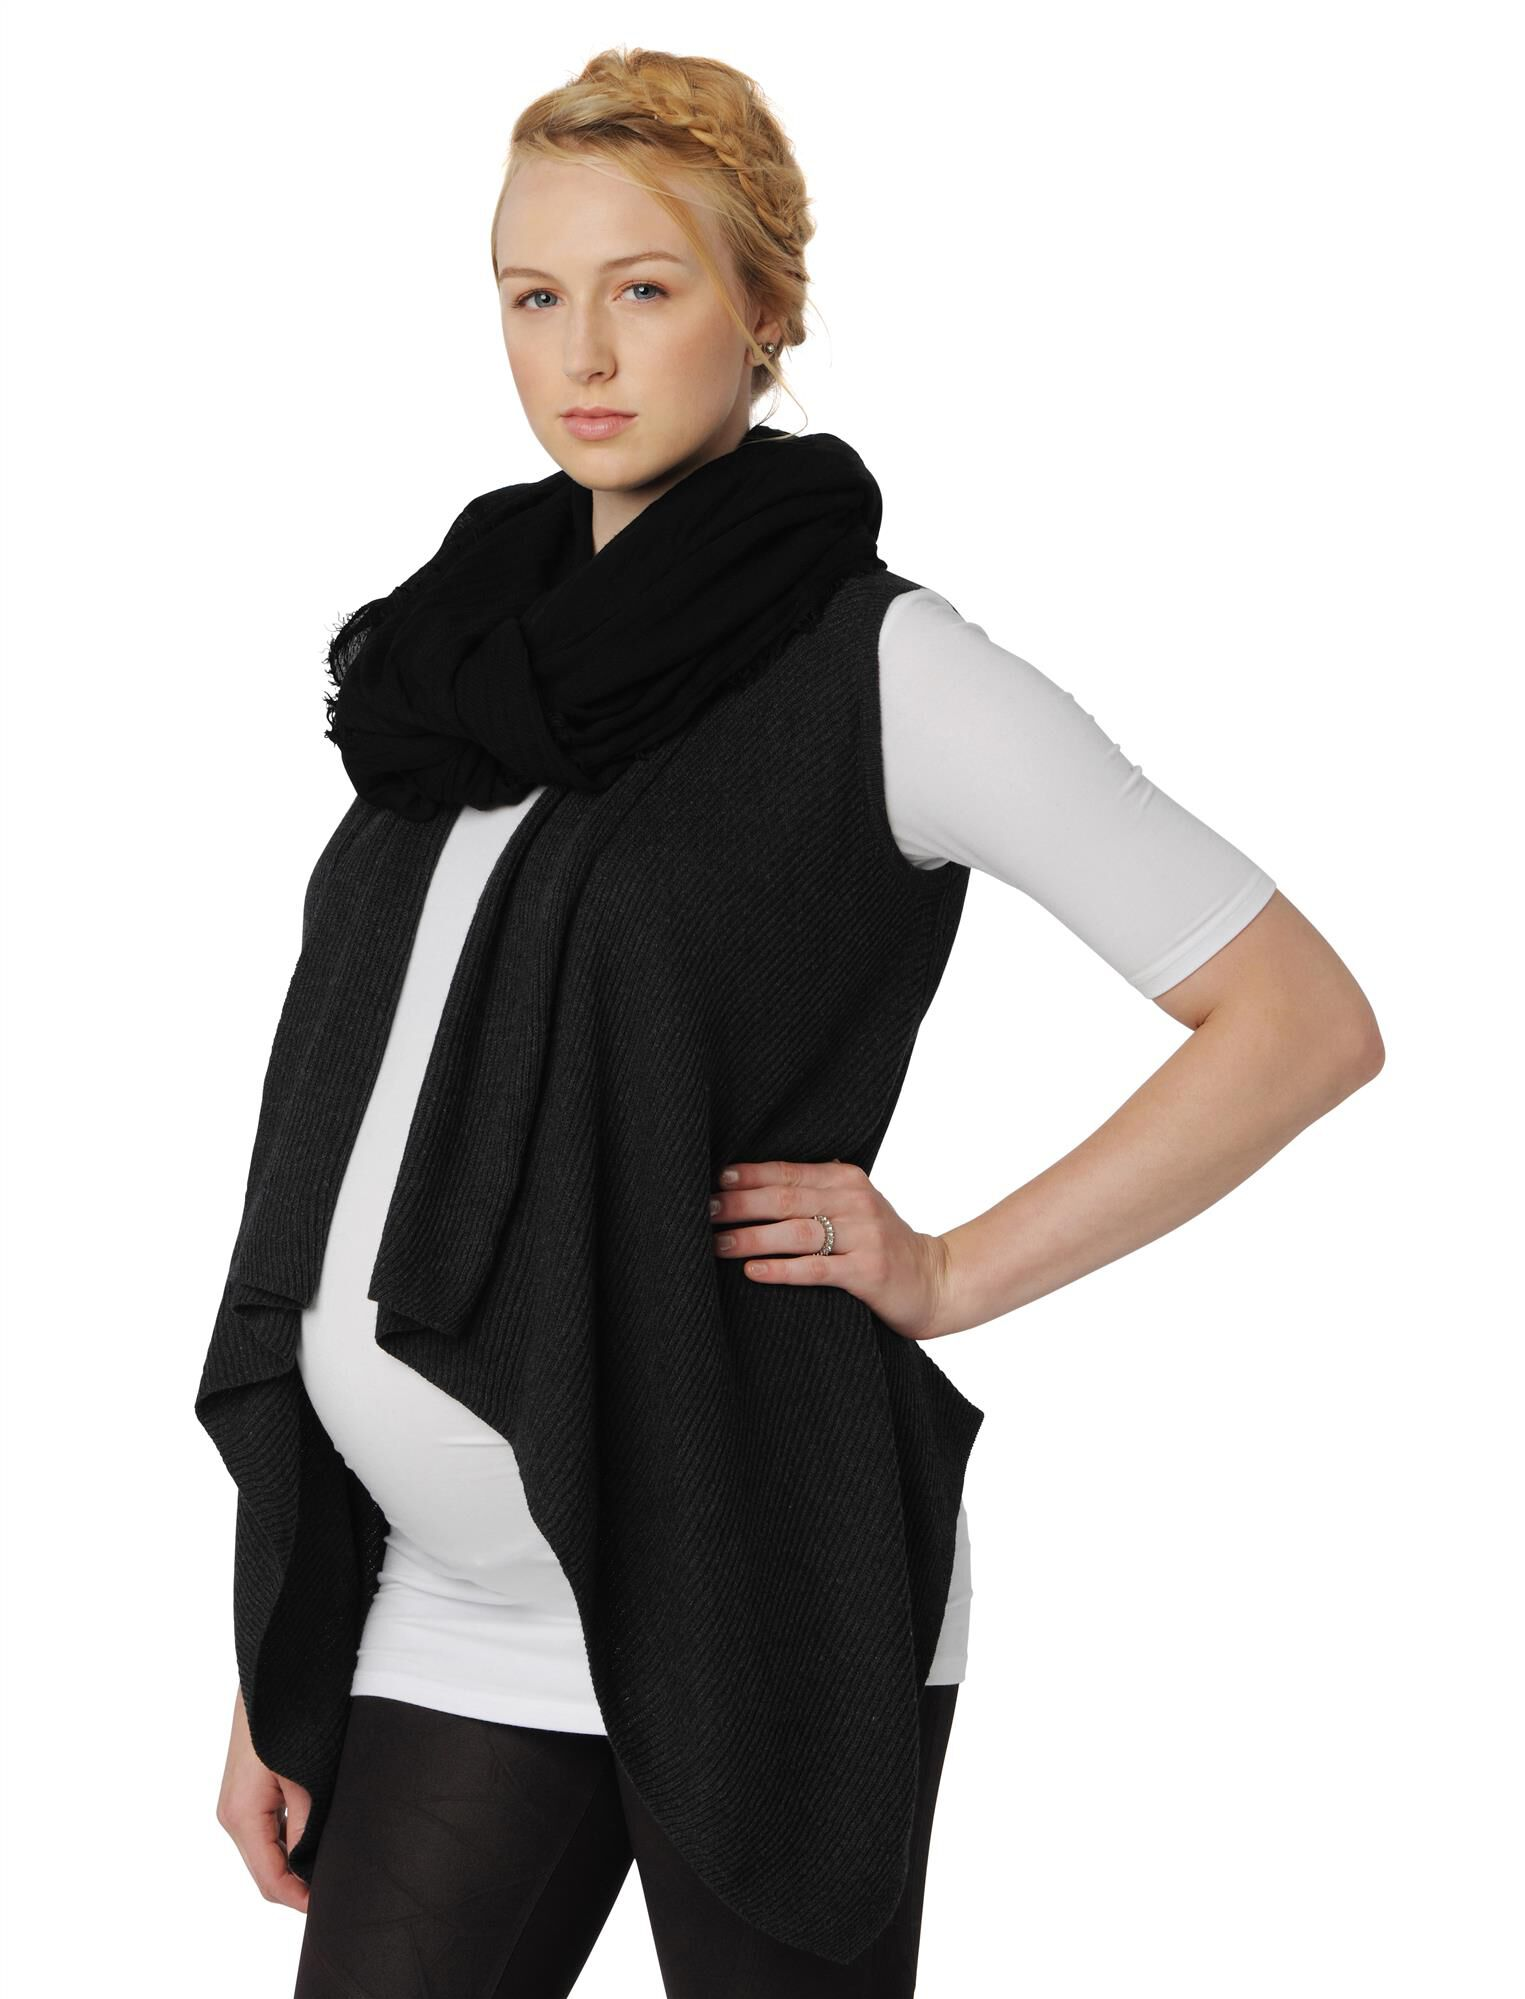 Splendid Bias Cut Maternity Vest